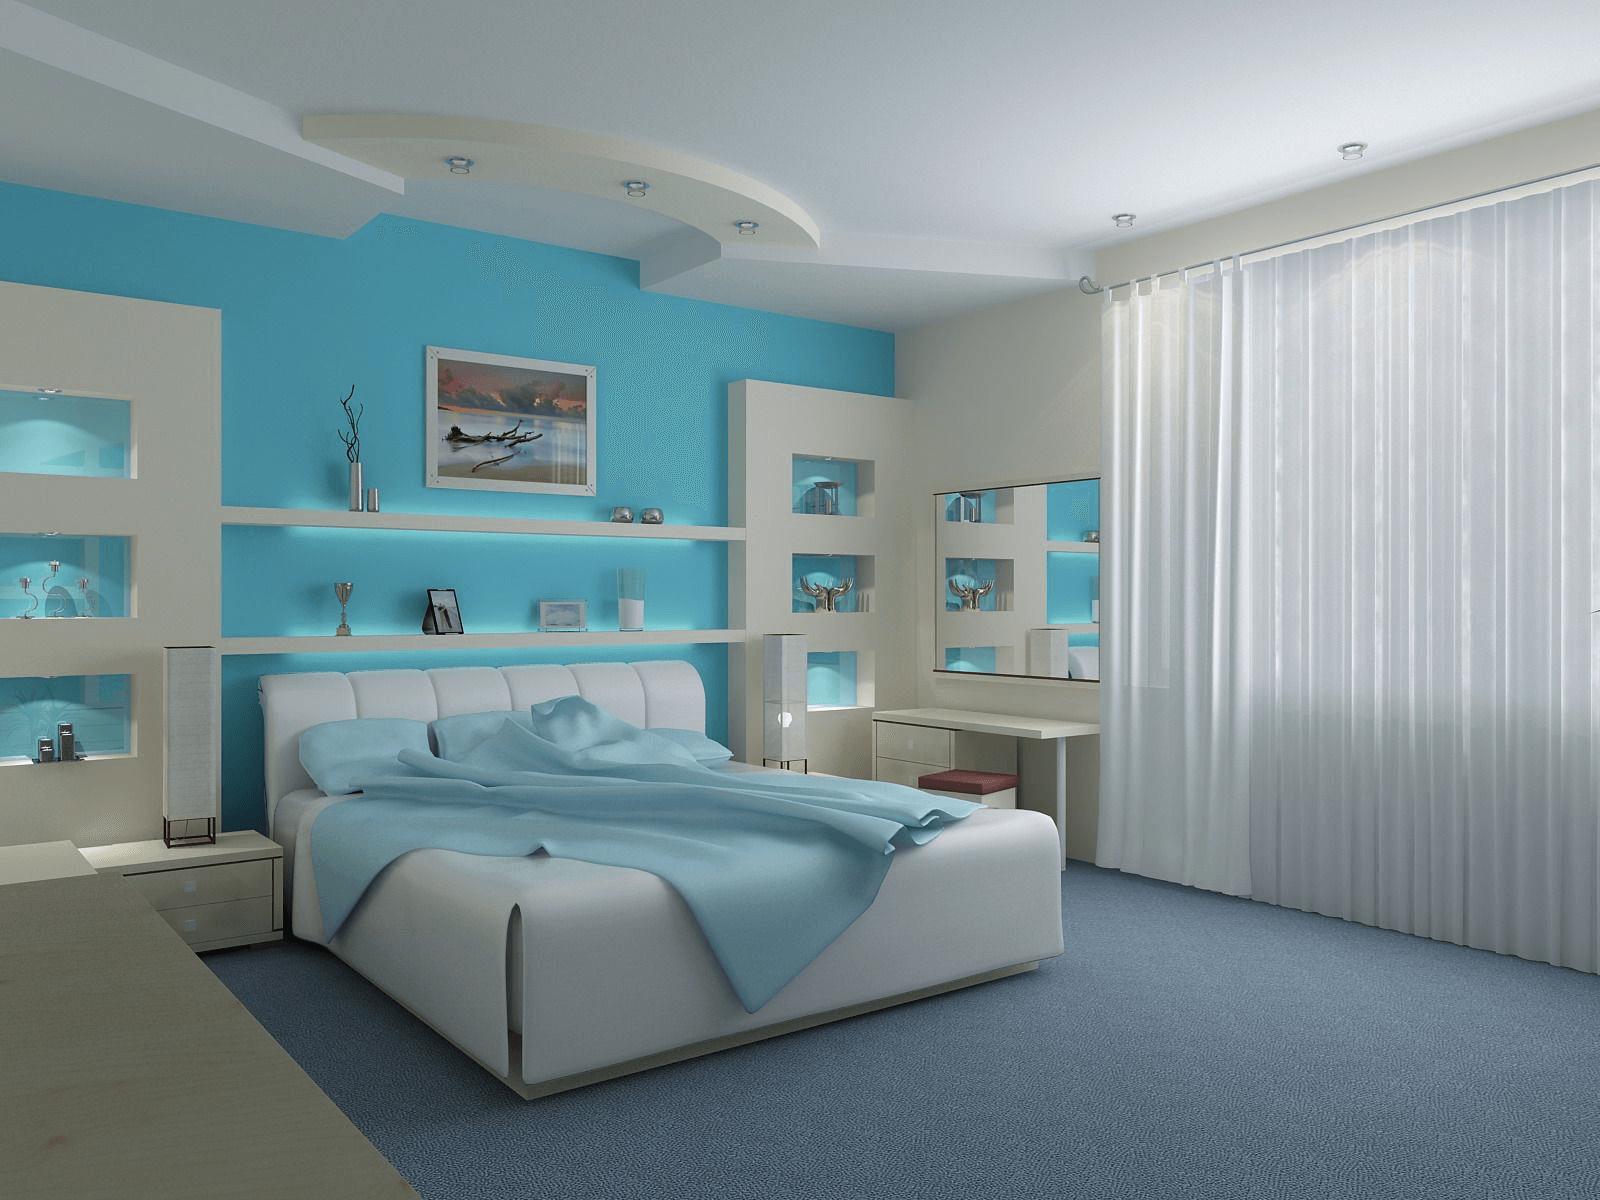 Blue skywall bedroom color ideas